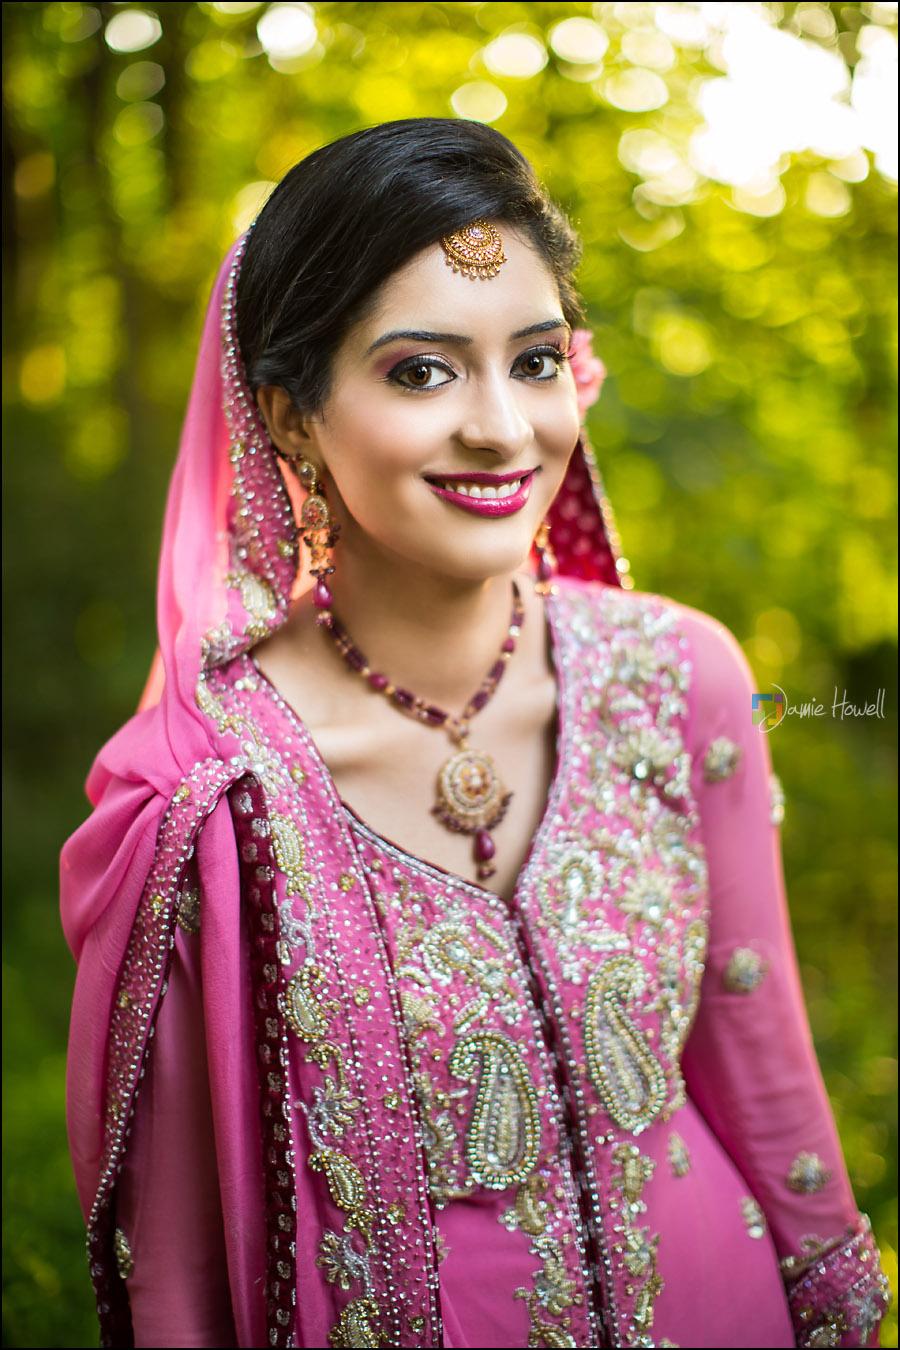 Ahmad_engagement-42